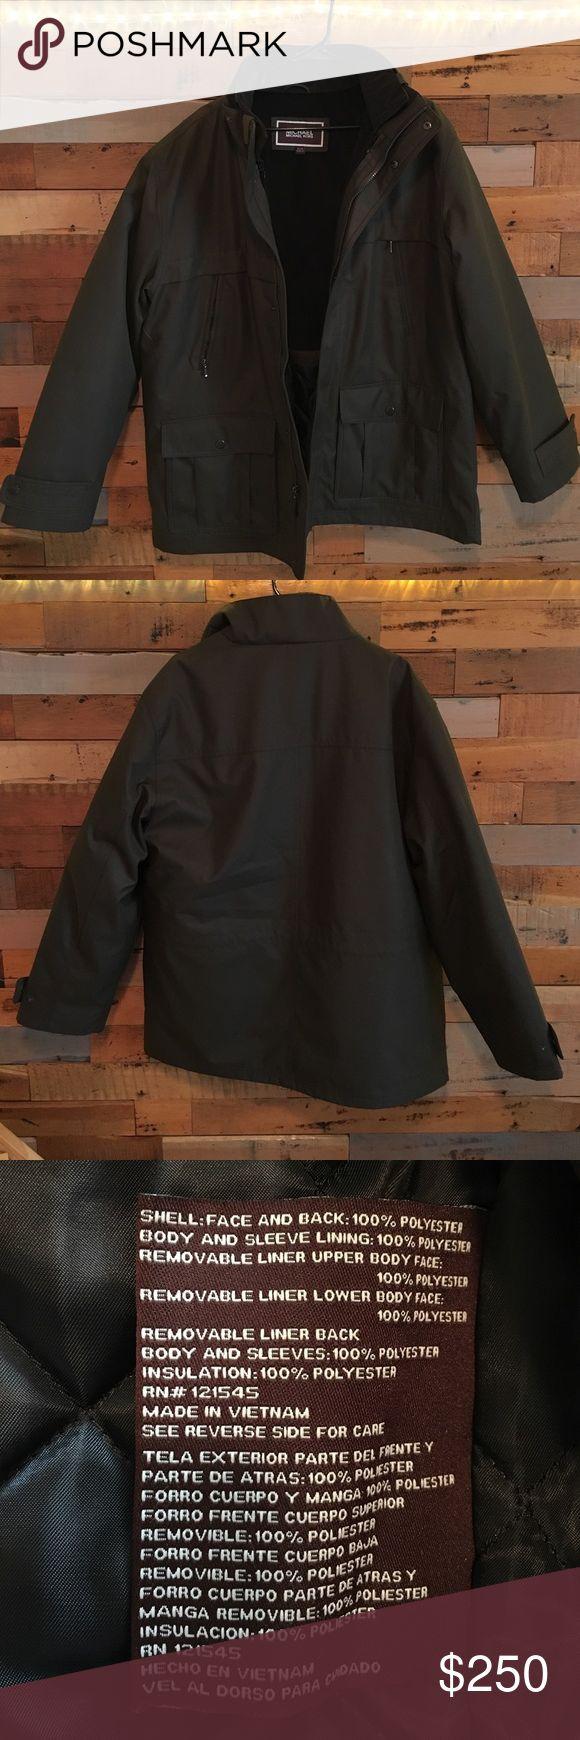 Michael Kors Men's Jacket Very heavy beautiful designer Men's jacket. Has only been worn one time so it is in perfect condition. ZERO FLAWS. MICHAEL Michael Kors Jackets & Coats